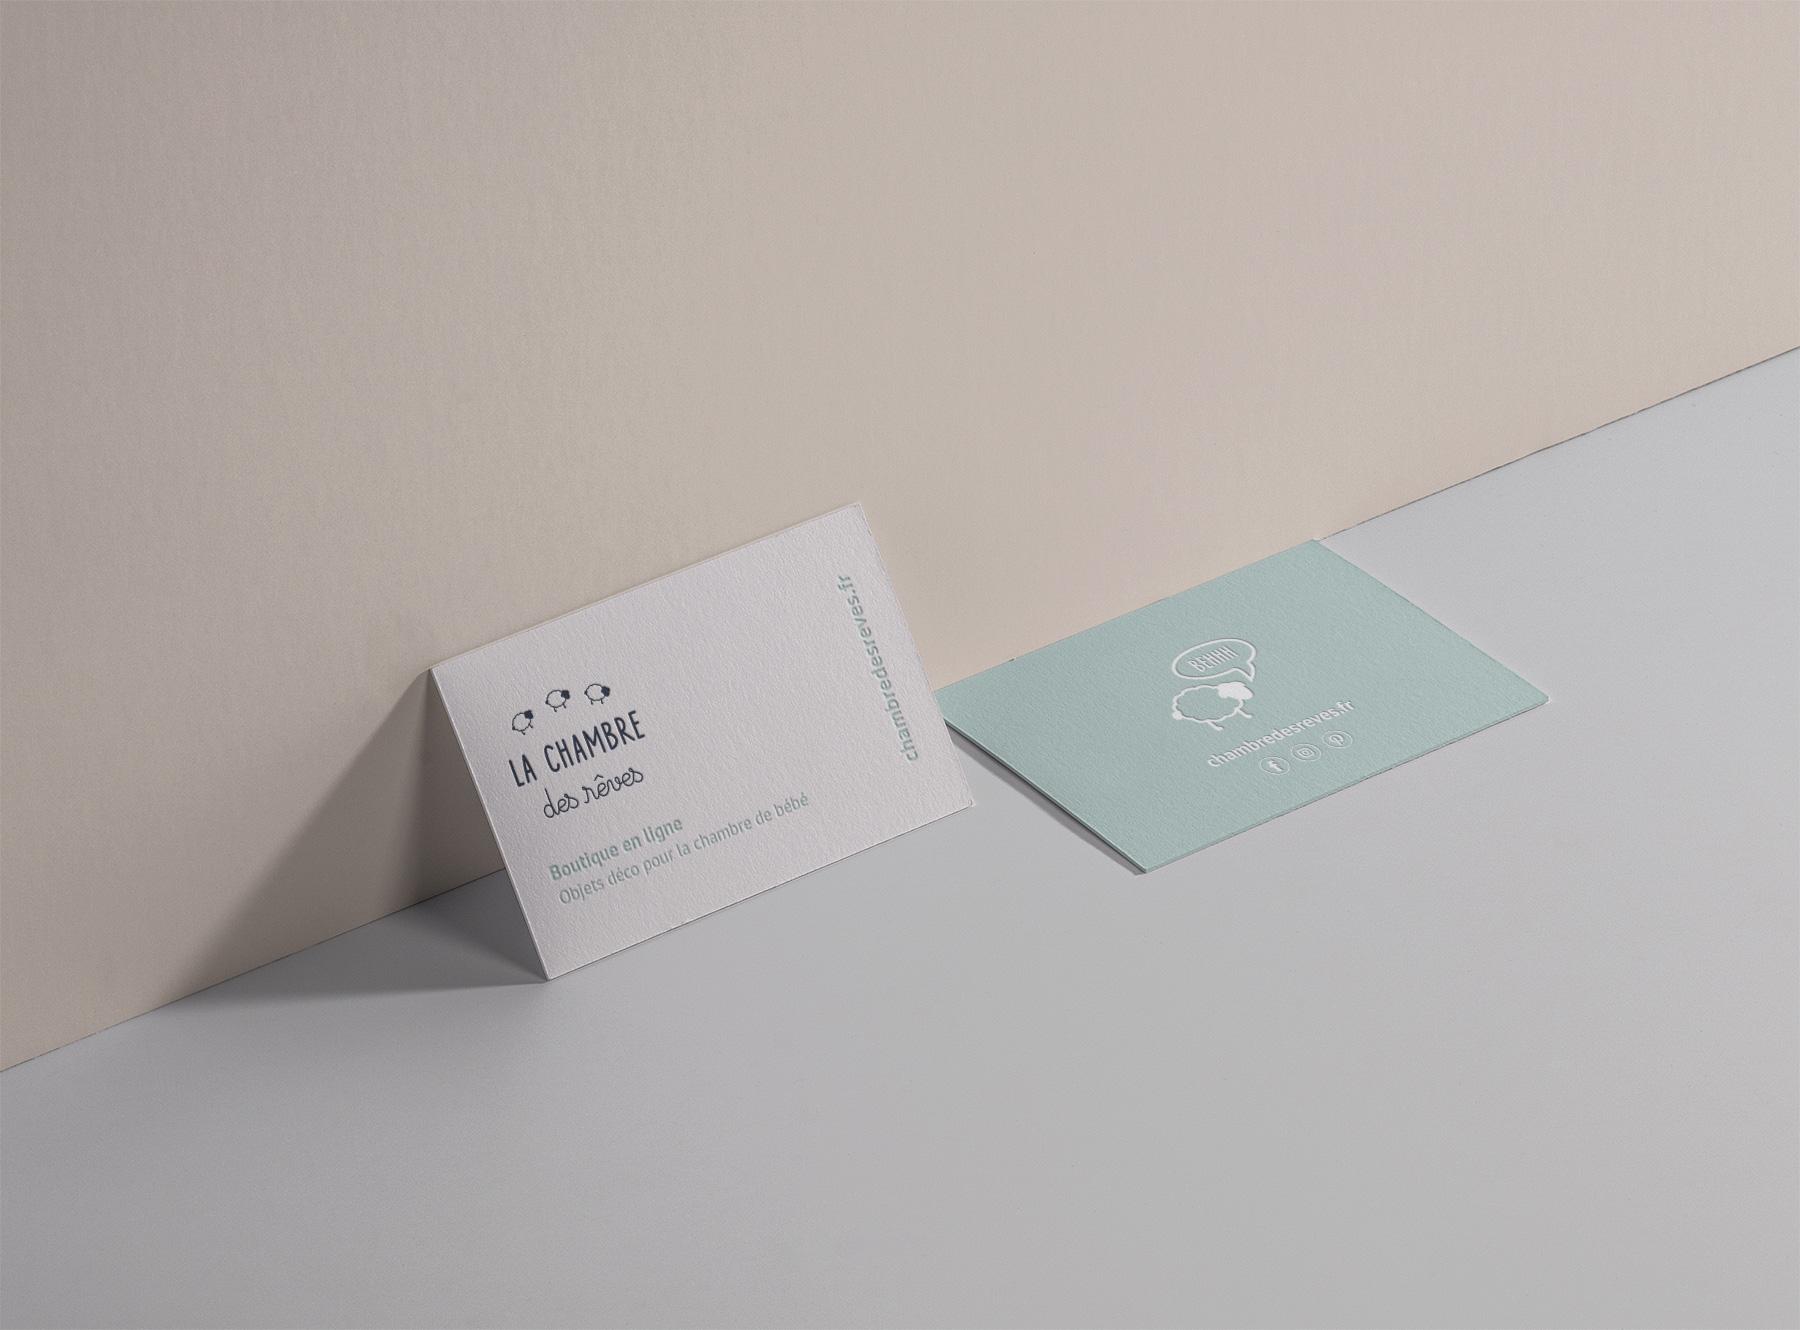 La-chambre-des-reves-portfolio-14